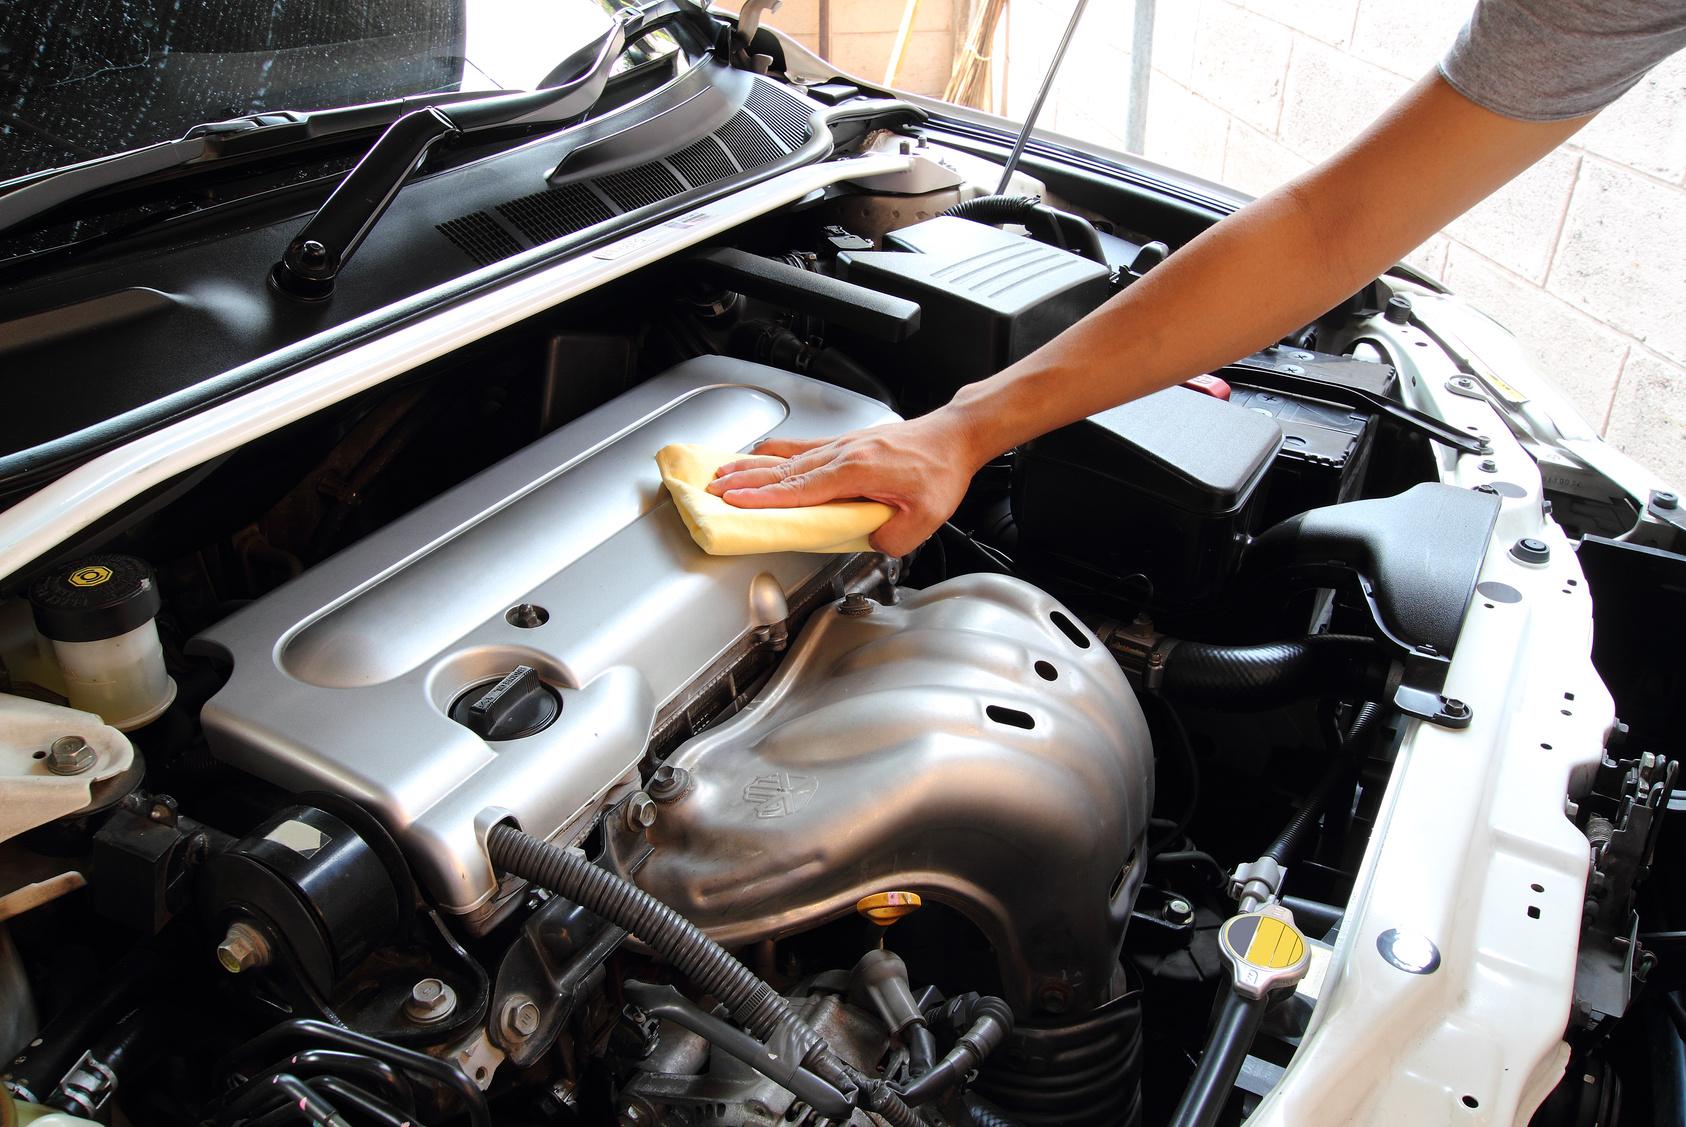 Wipe the car engine